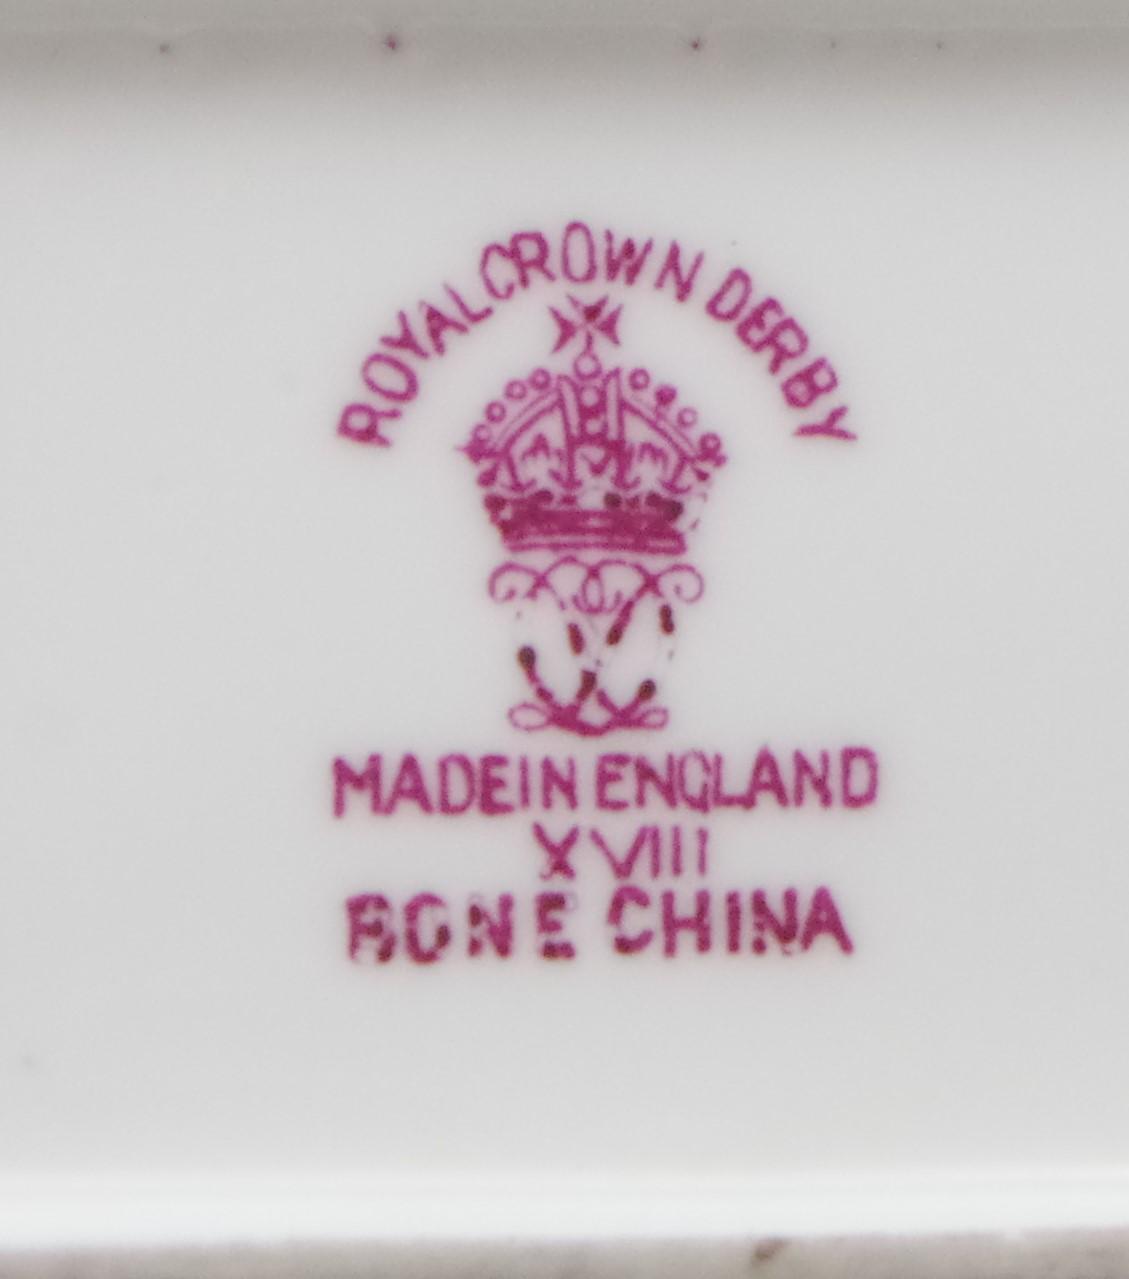 royal-crown-derby-H-E-Sheikh-Duaij-Salman-Al-Sabah-oblong-heraldic-tray-mark